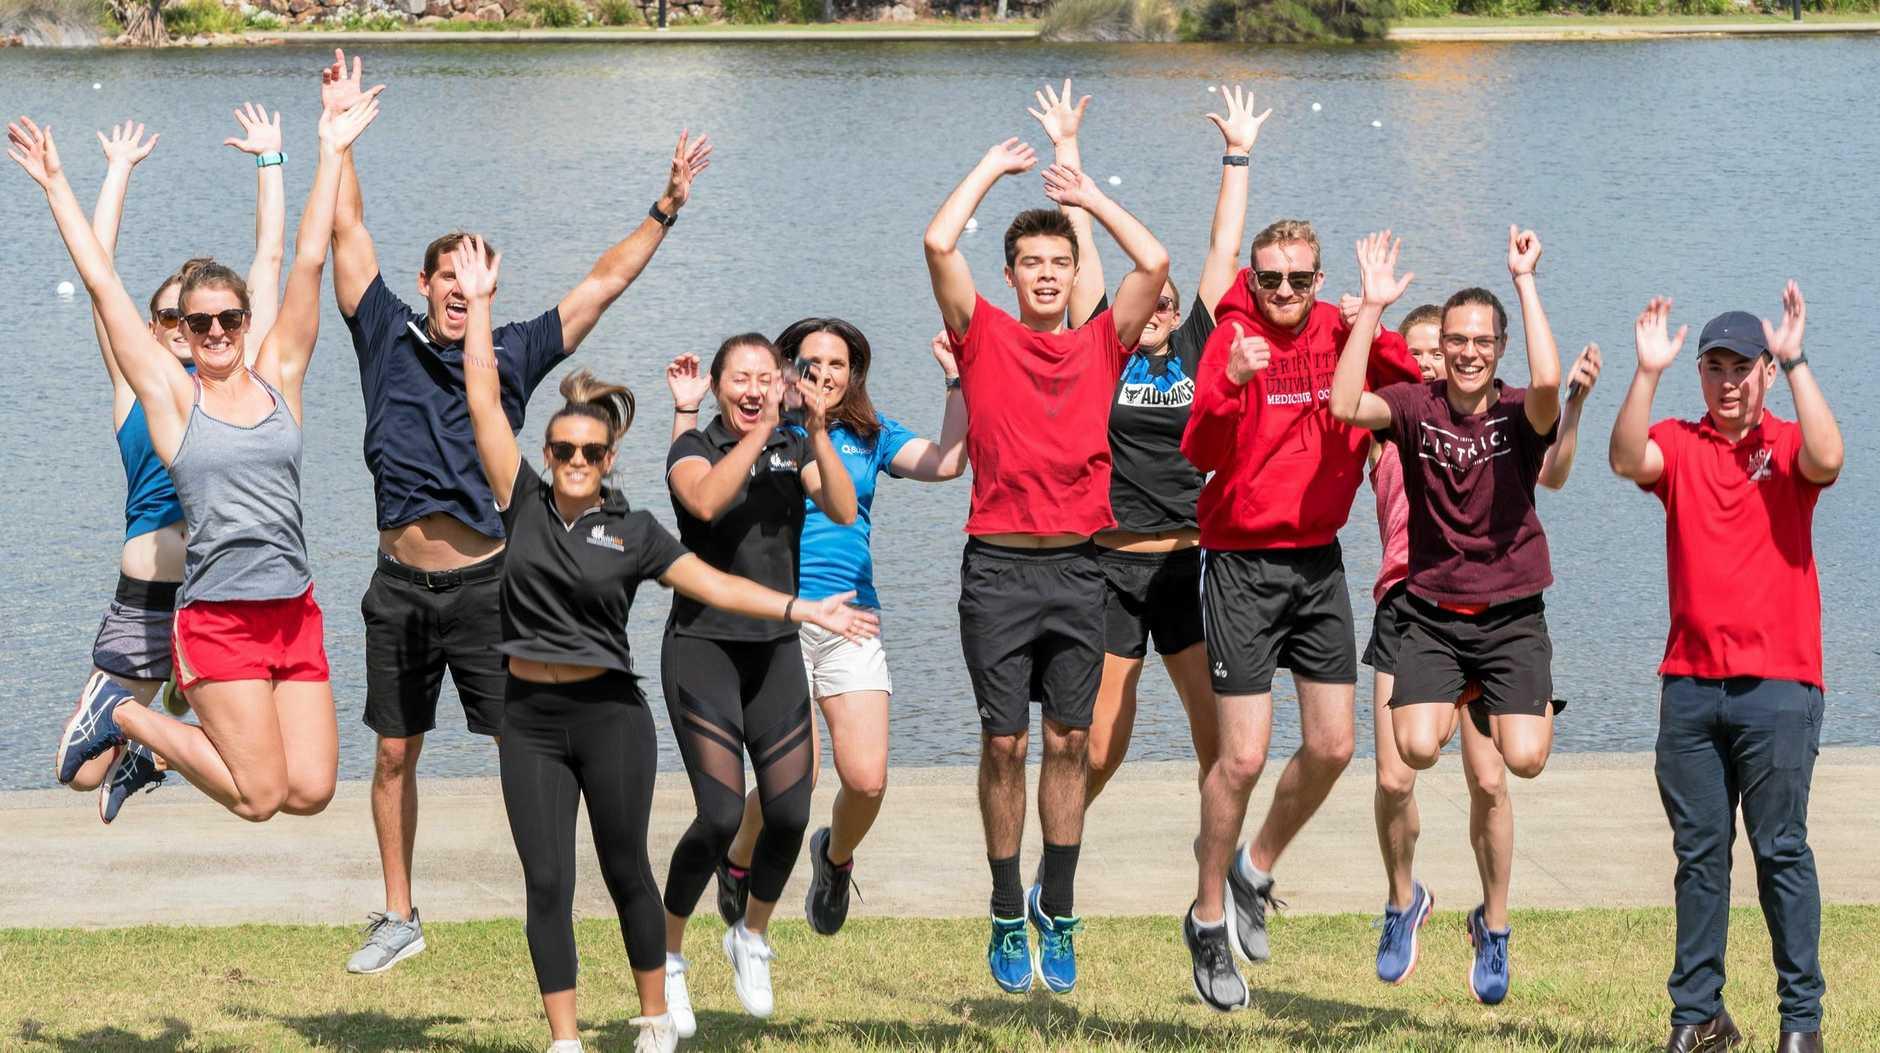 THE JOY OF RUNNING: Wishlist Fun Run will take place this Sunday, March 31, at Lake Kawana.